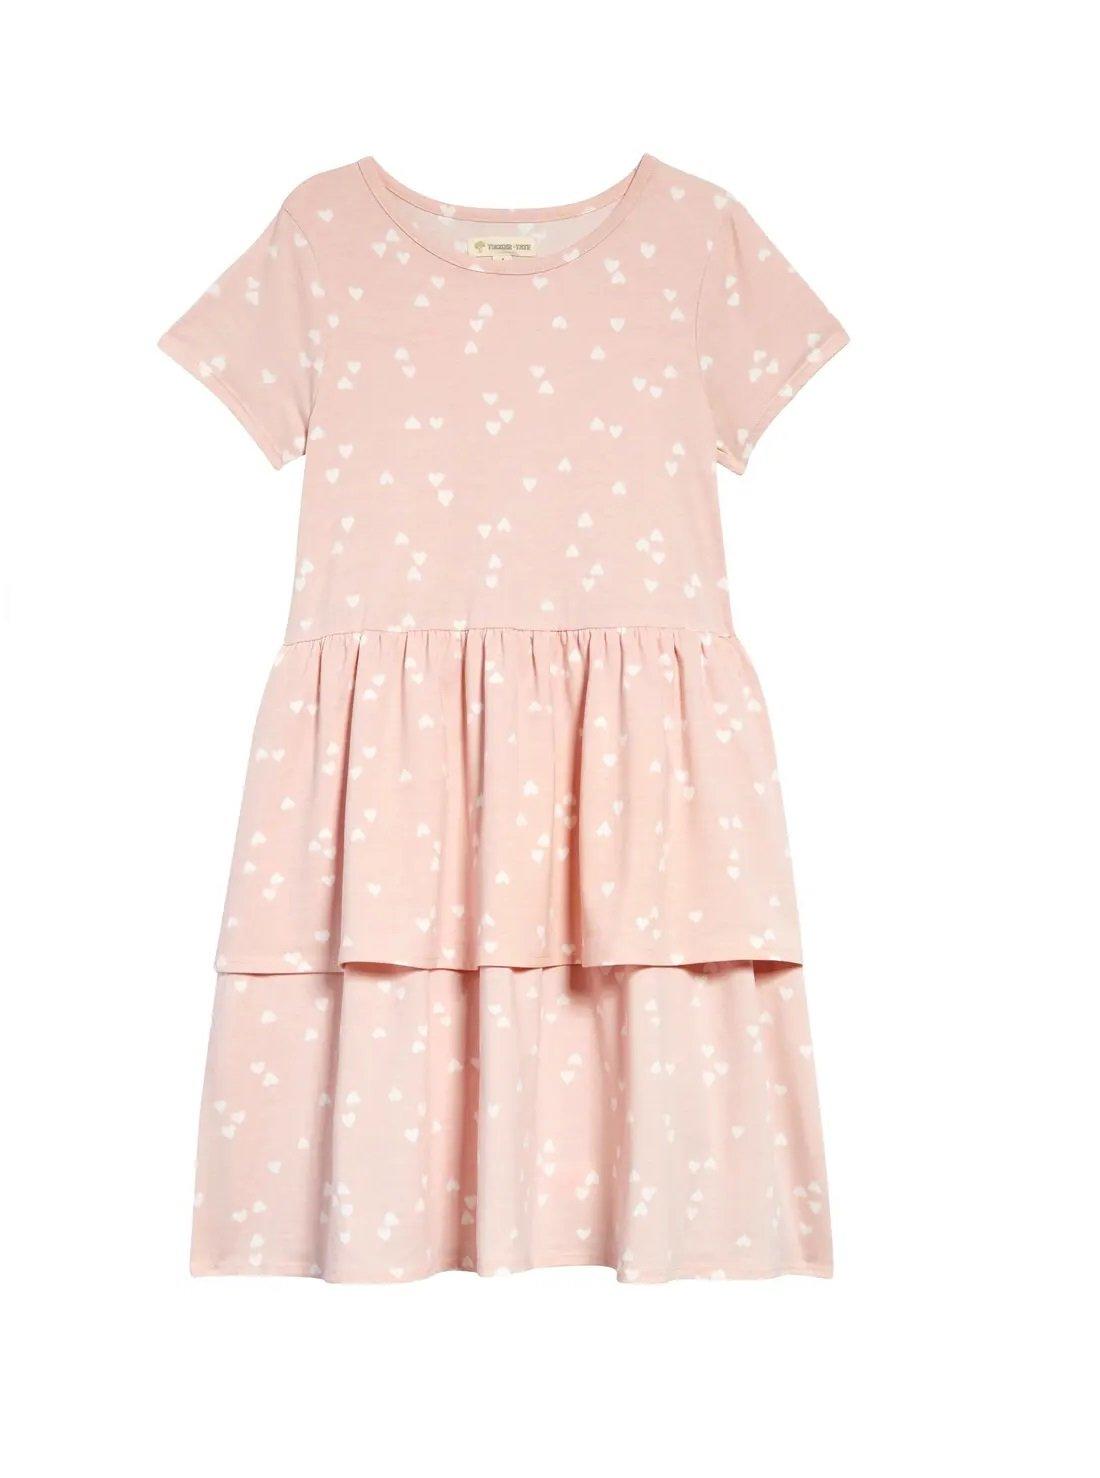 Kids' Polka Dot Tier Dress